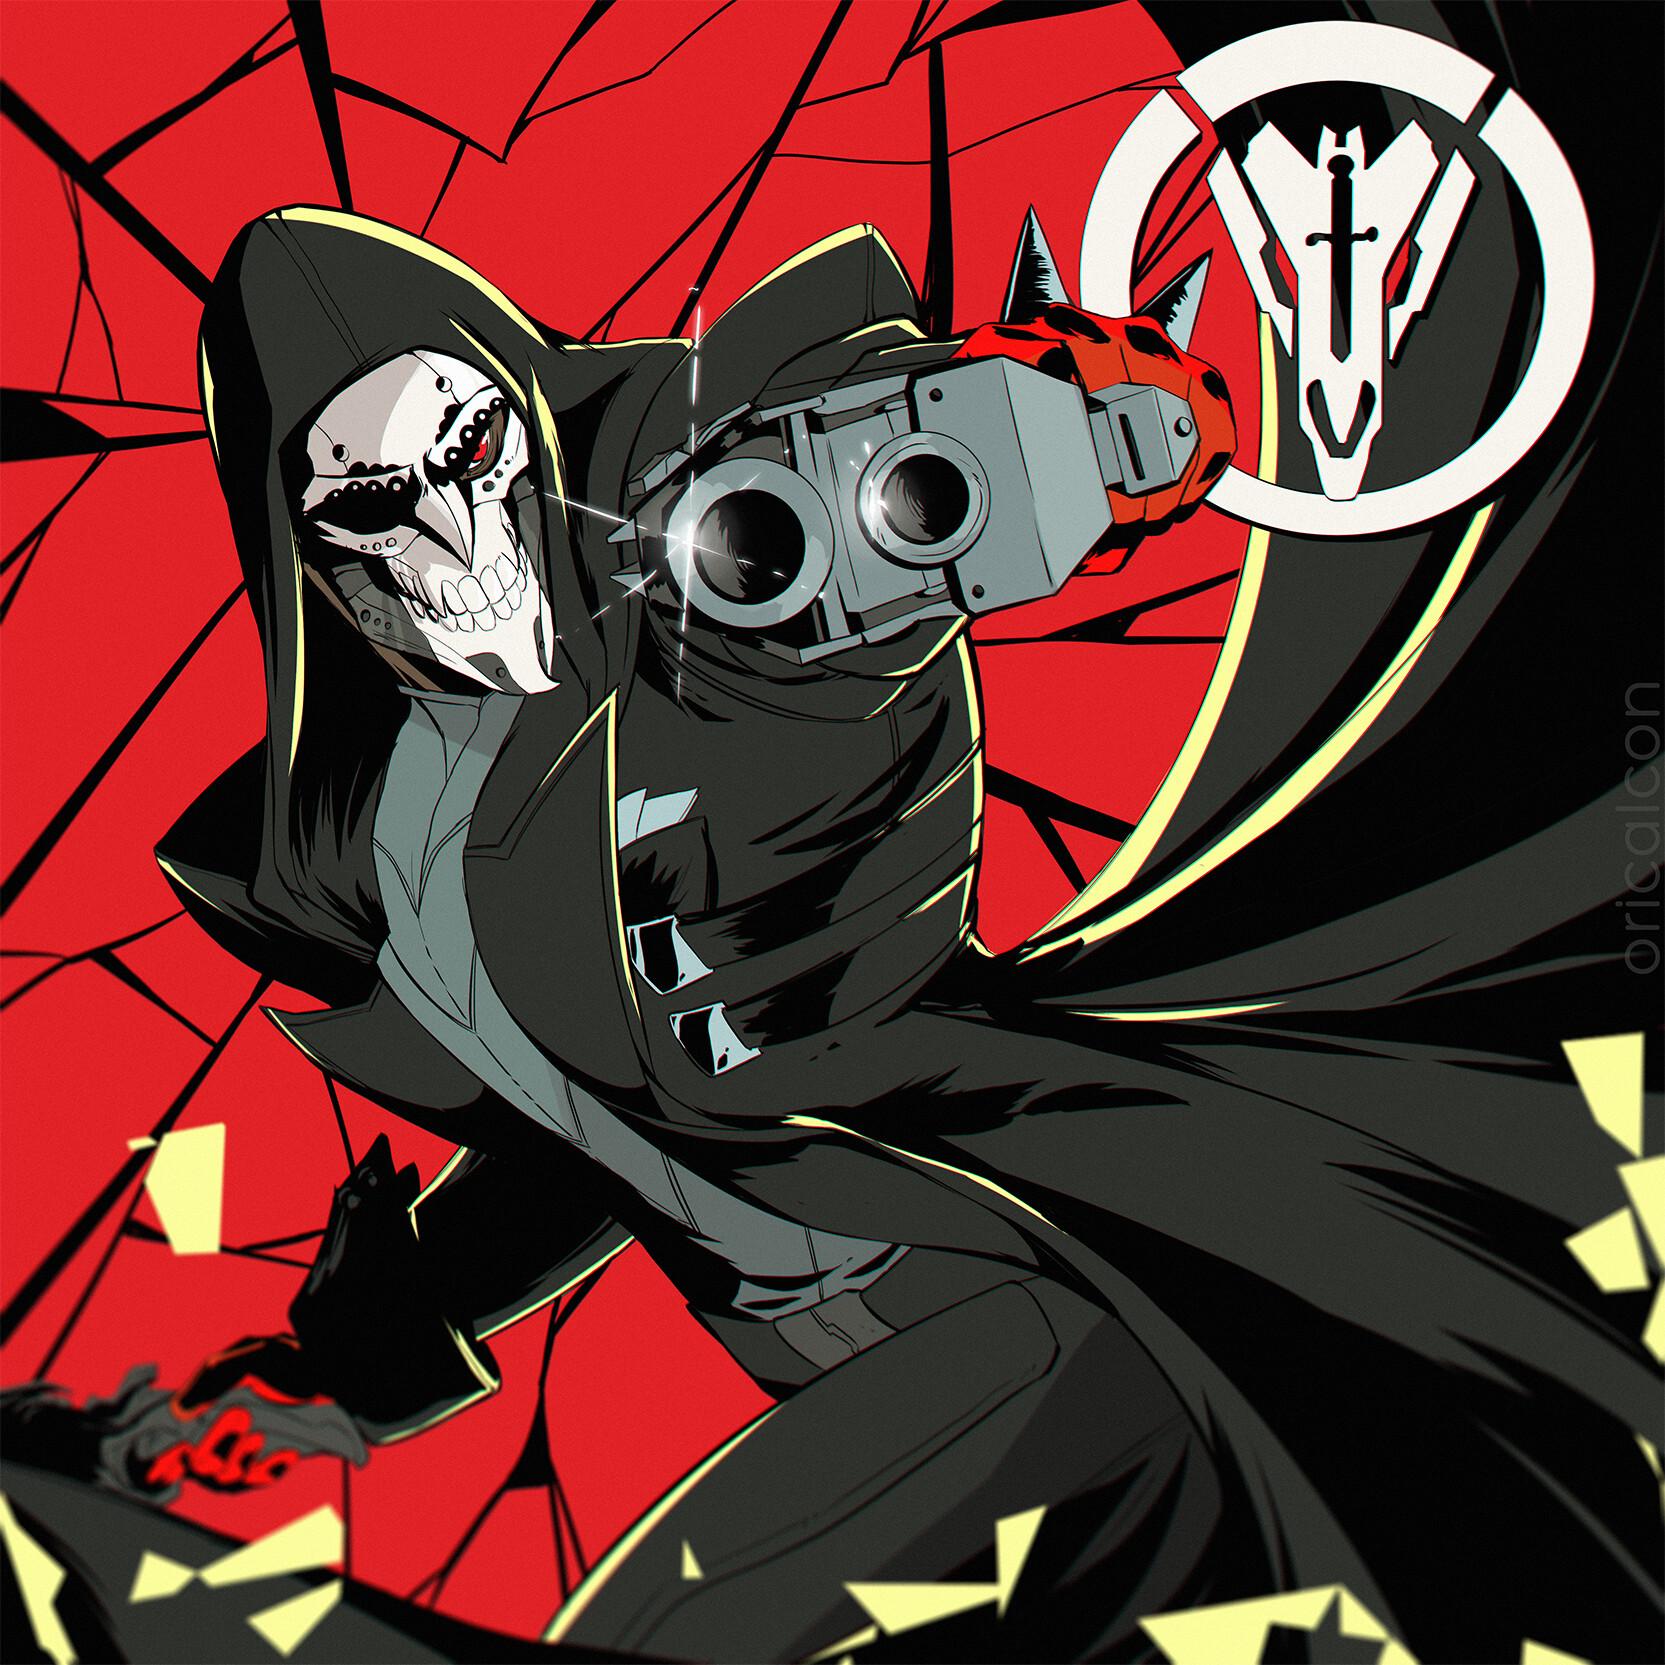 Reaper-(Overwatch)-Overwatch-Blizzard-фэндомы-5064107.jpeg - Overwatch